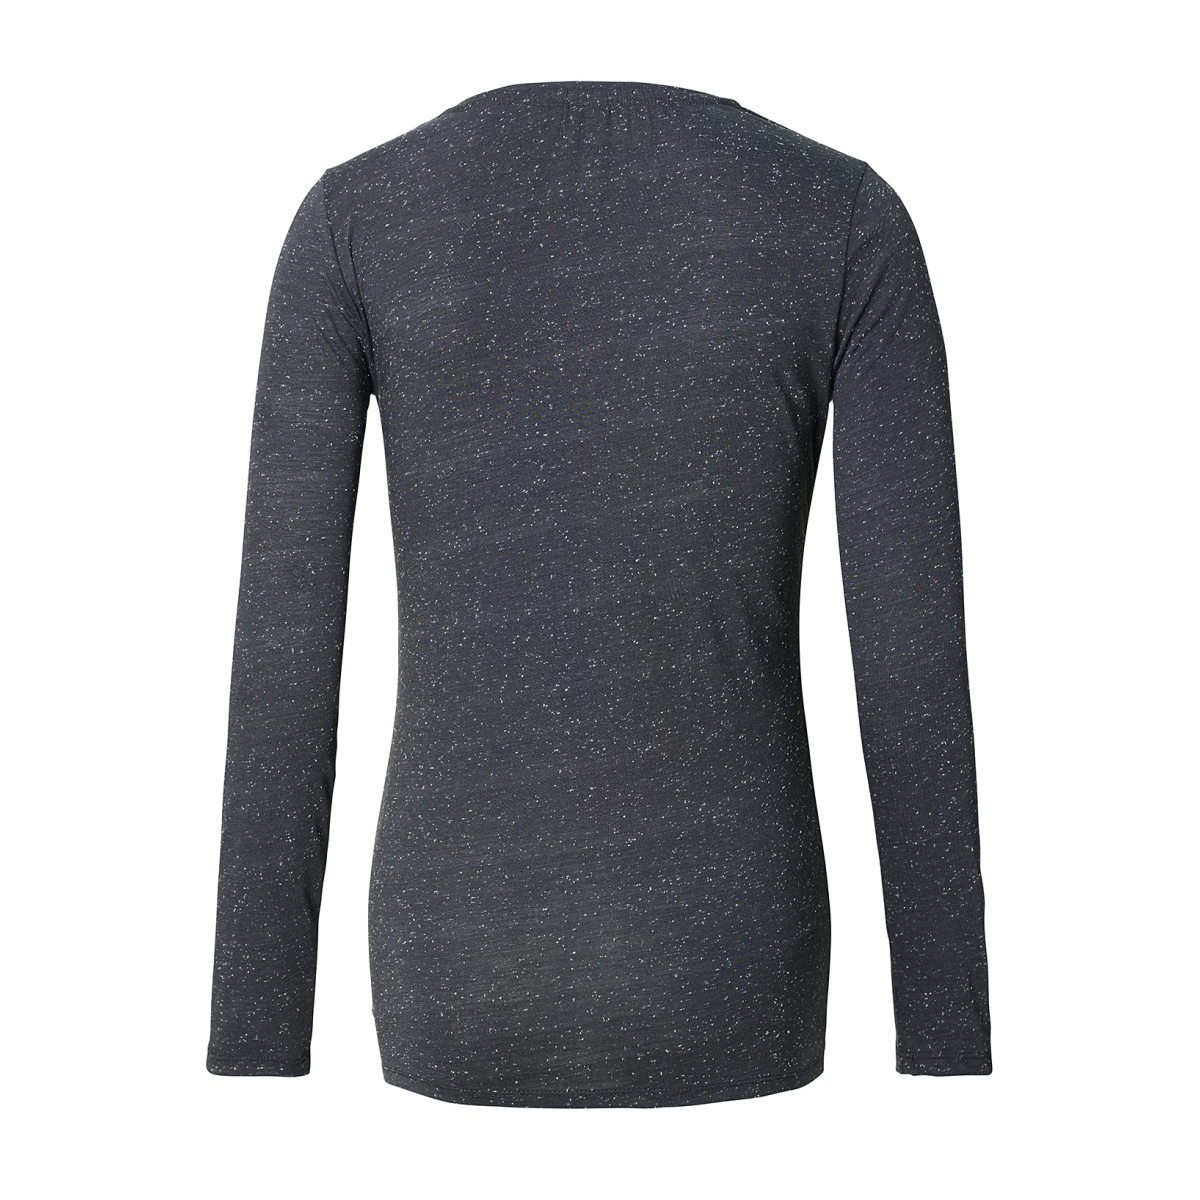 70628 tee helga anthra noppies positie shirt anthracite